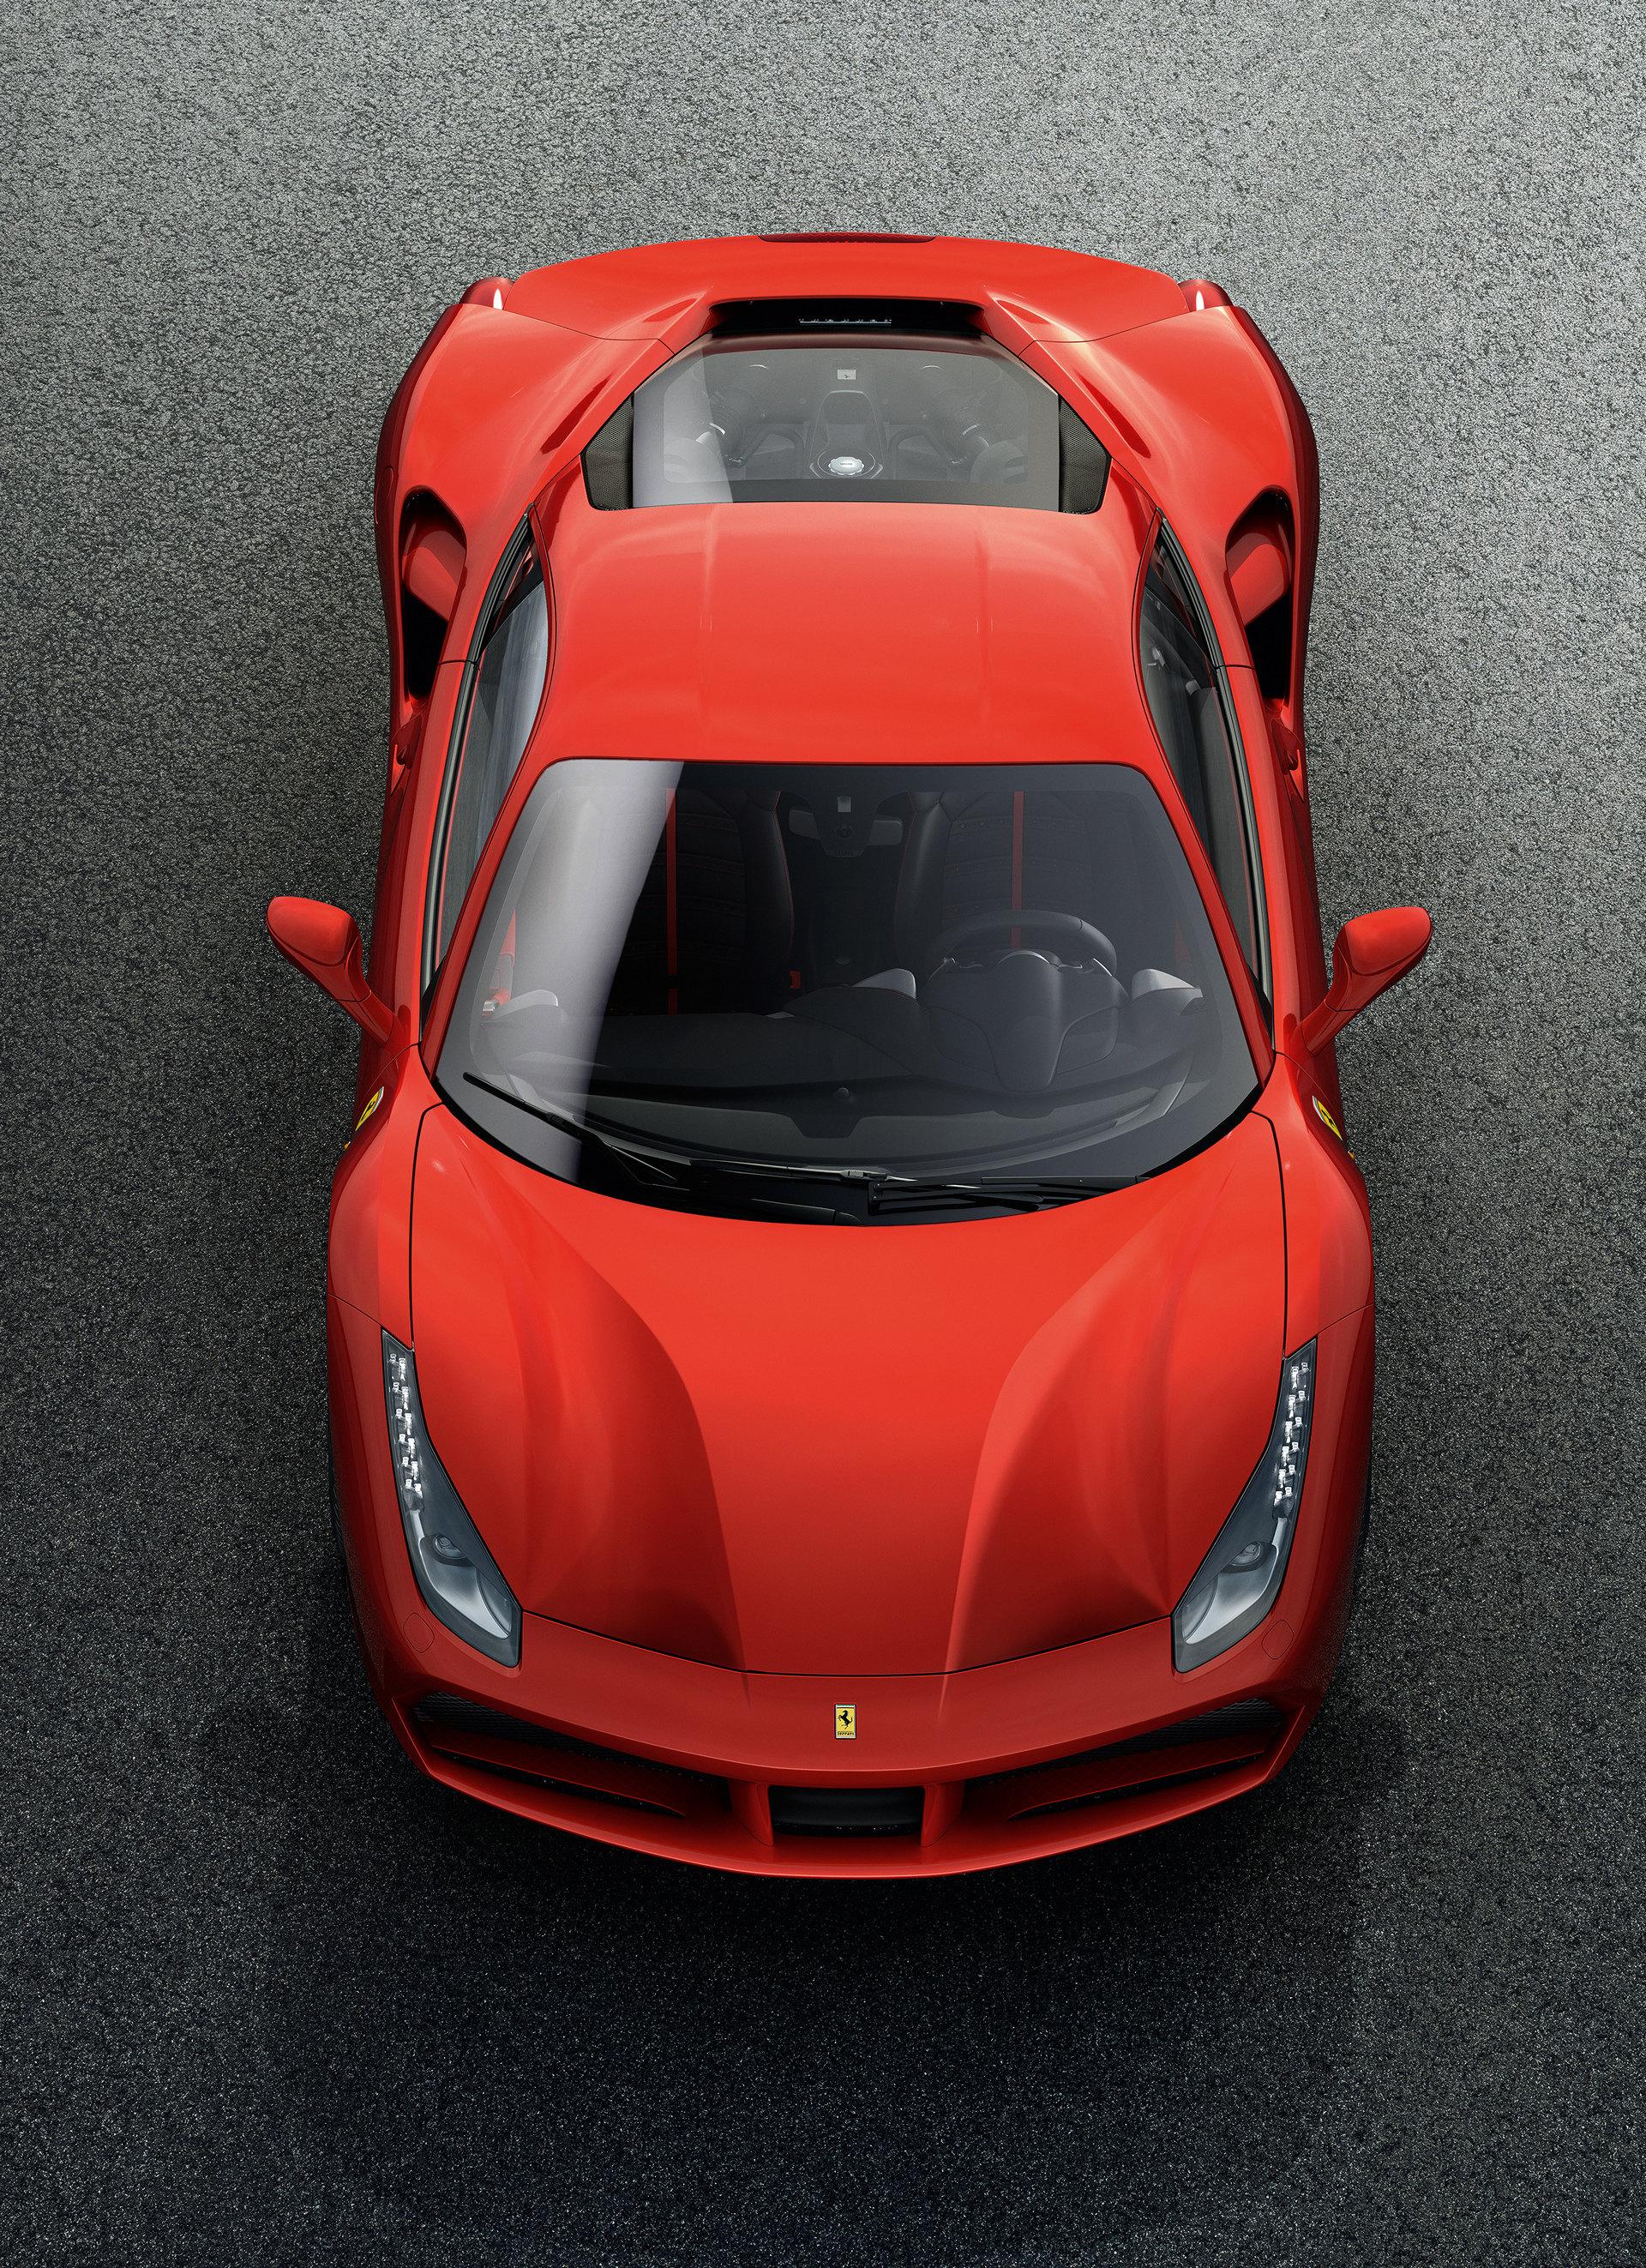 Ferrari 488 GTB © Fiat Chrysler Automobiles N.V.